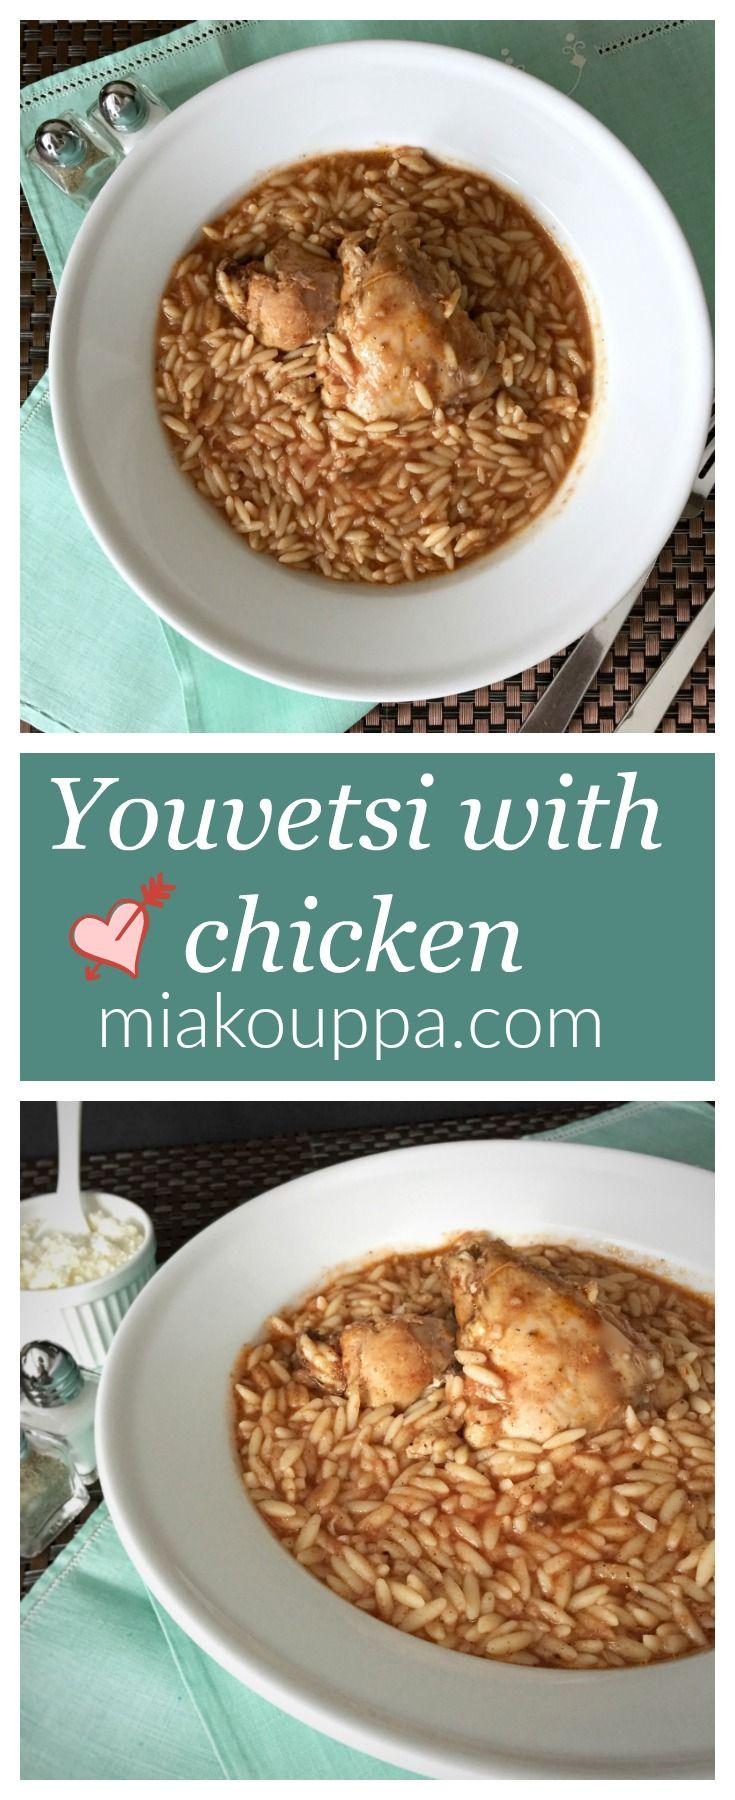 Best 25+ Food combining ideas on Pinterest | Food ...